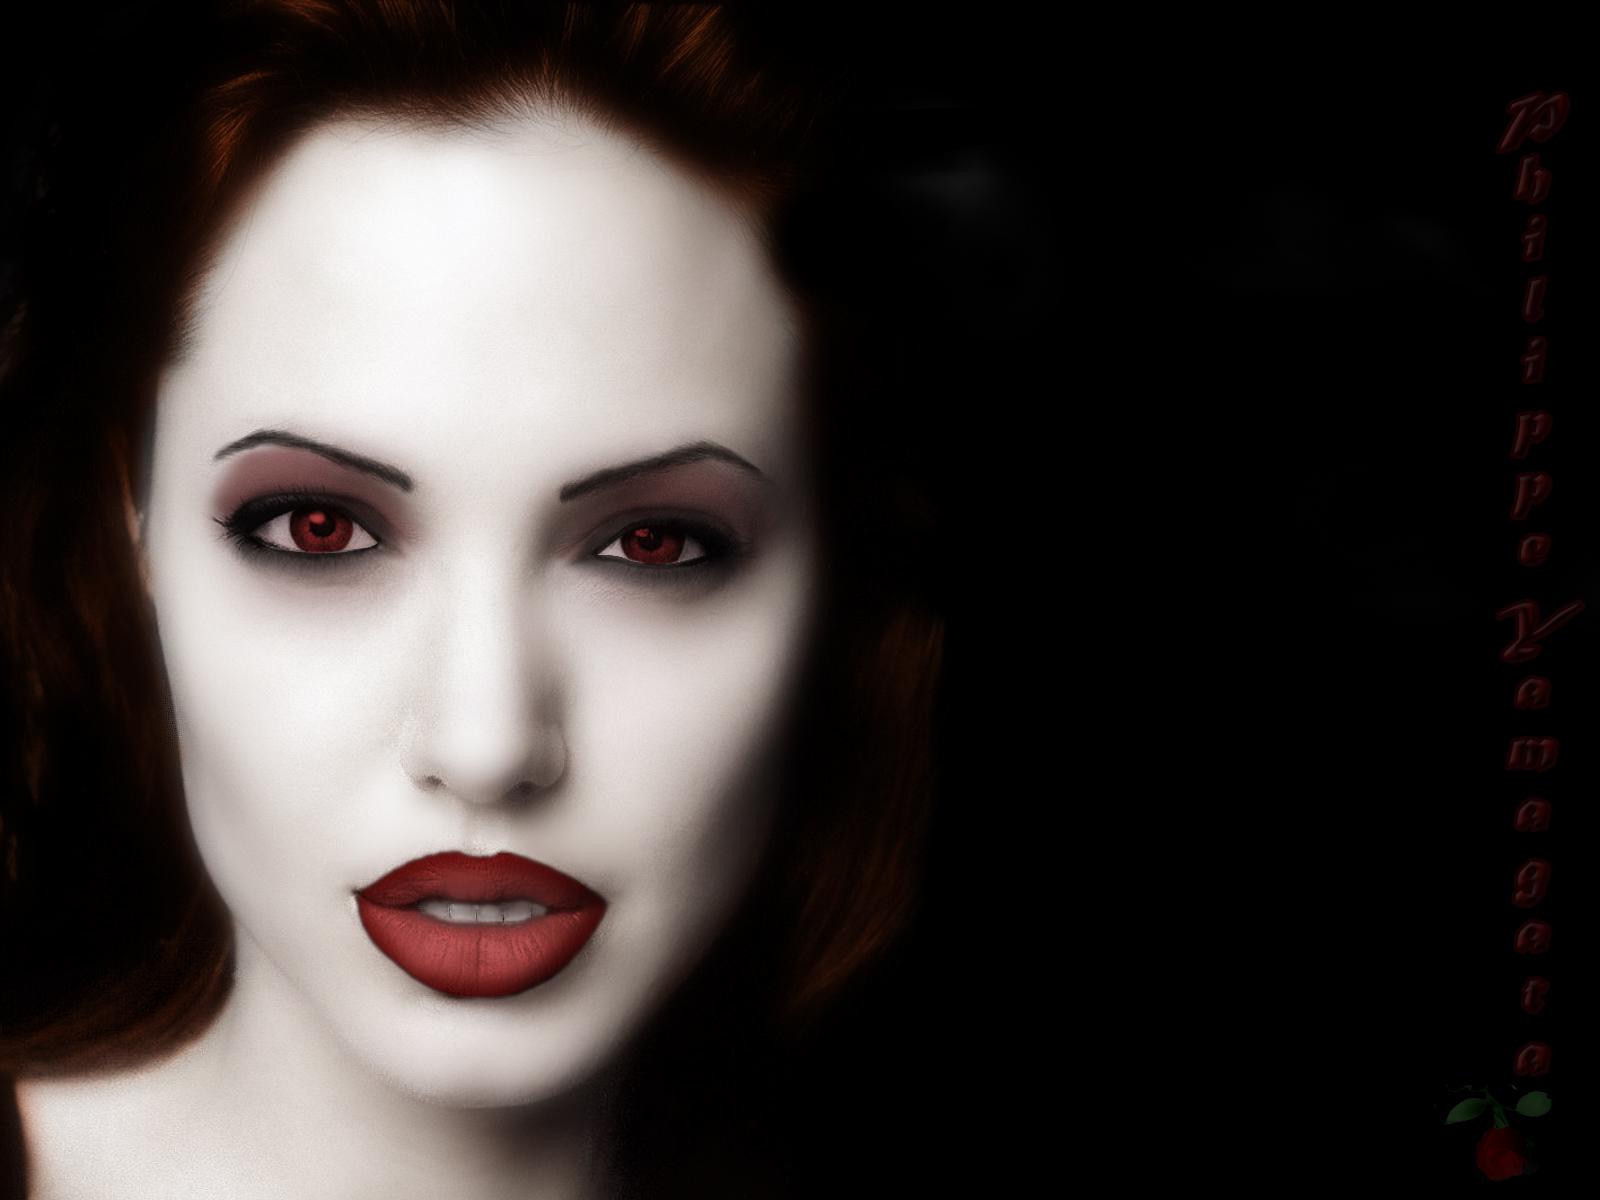 Как вести себя как вампир (девушки) - wikiHow 6